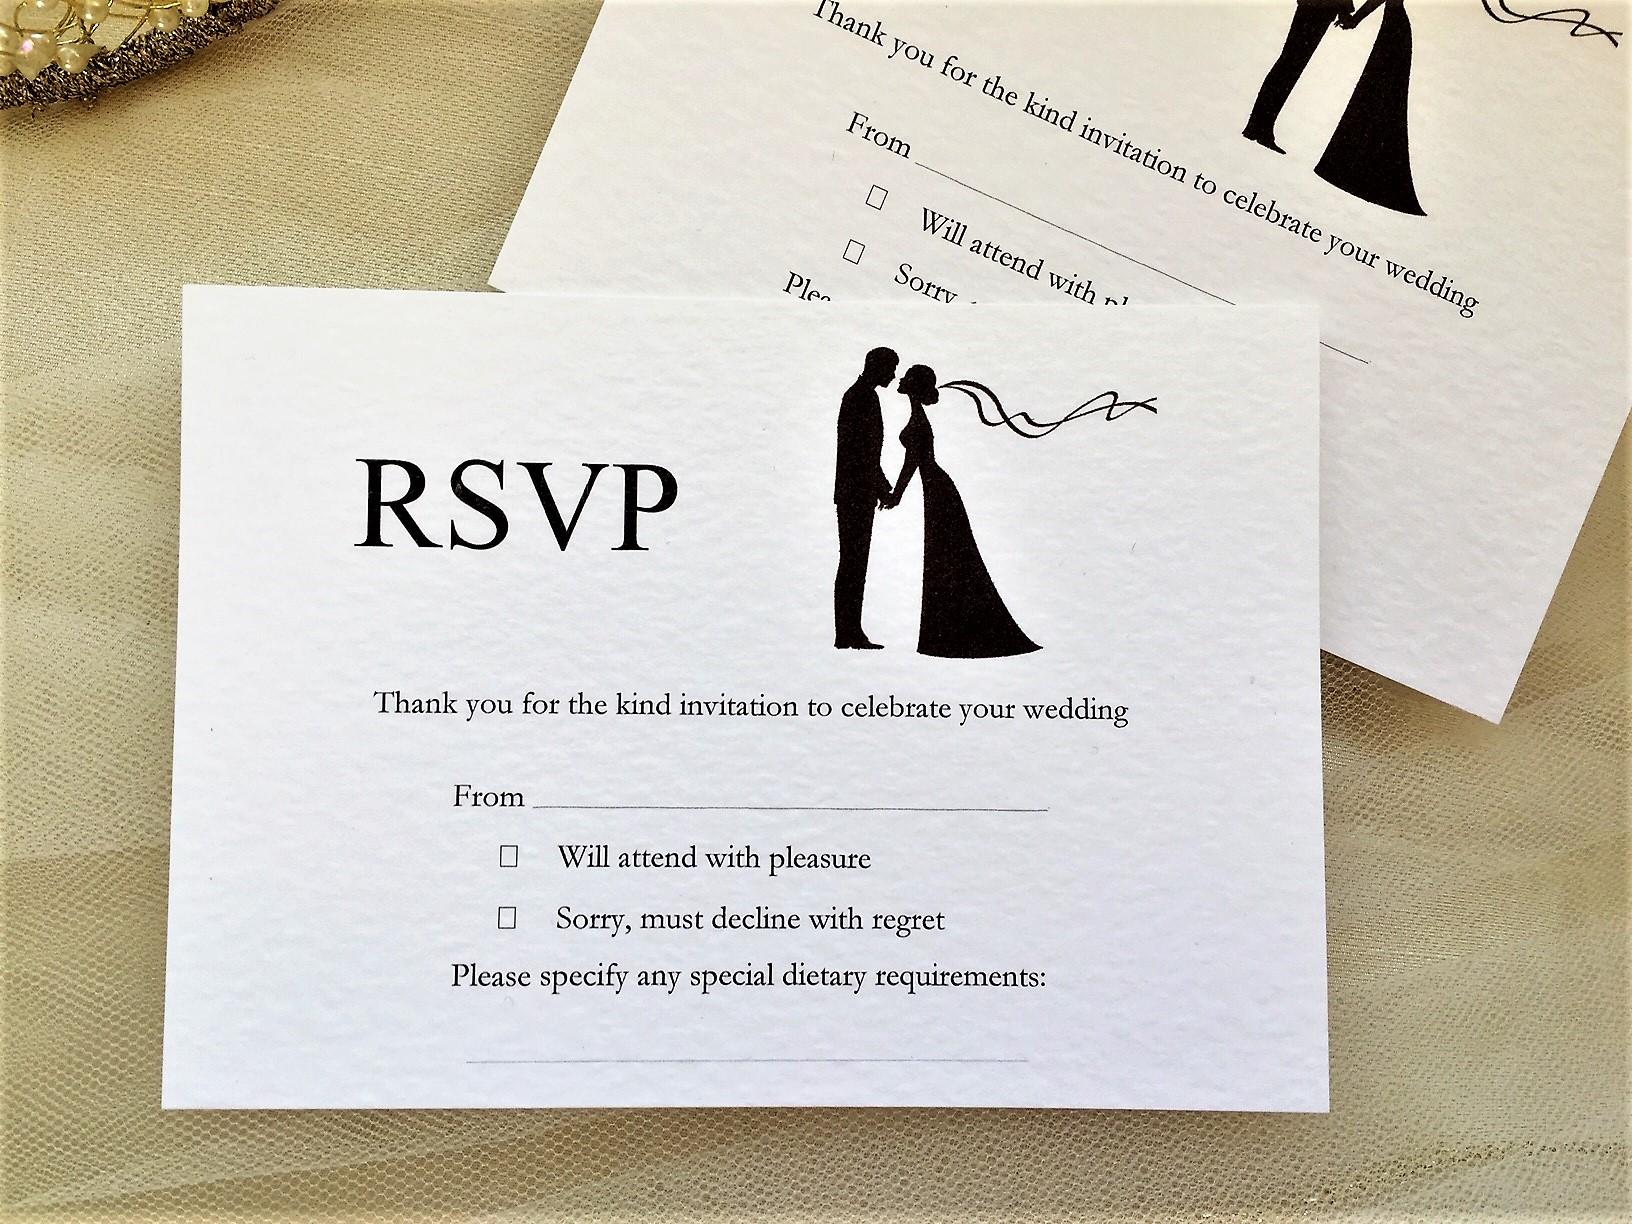 finally rsvp postcards 45p each